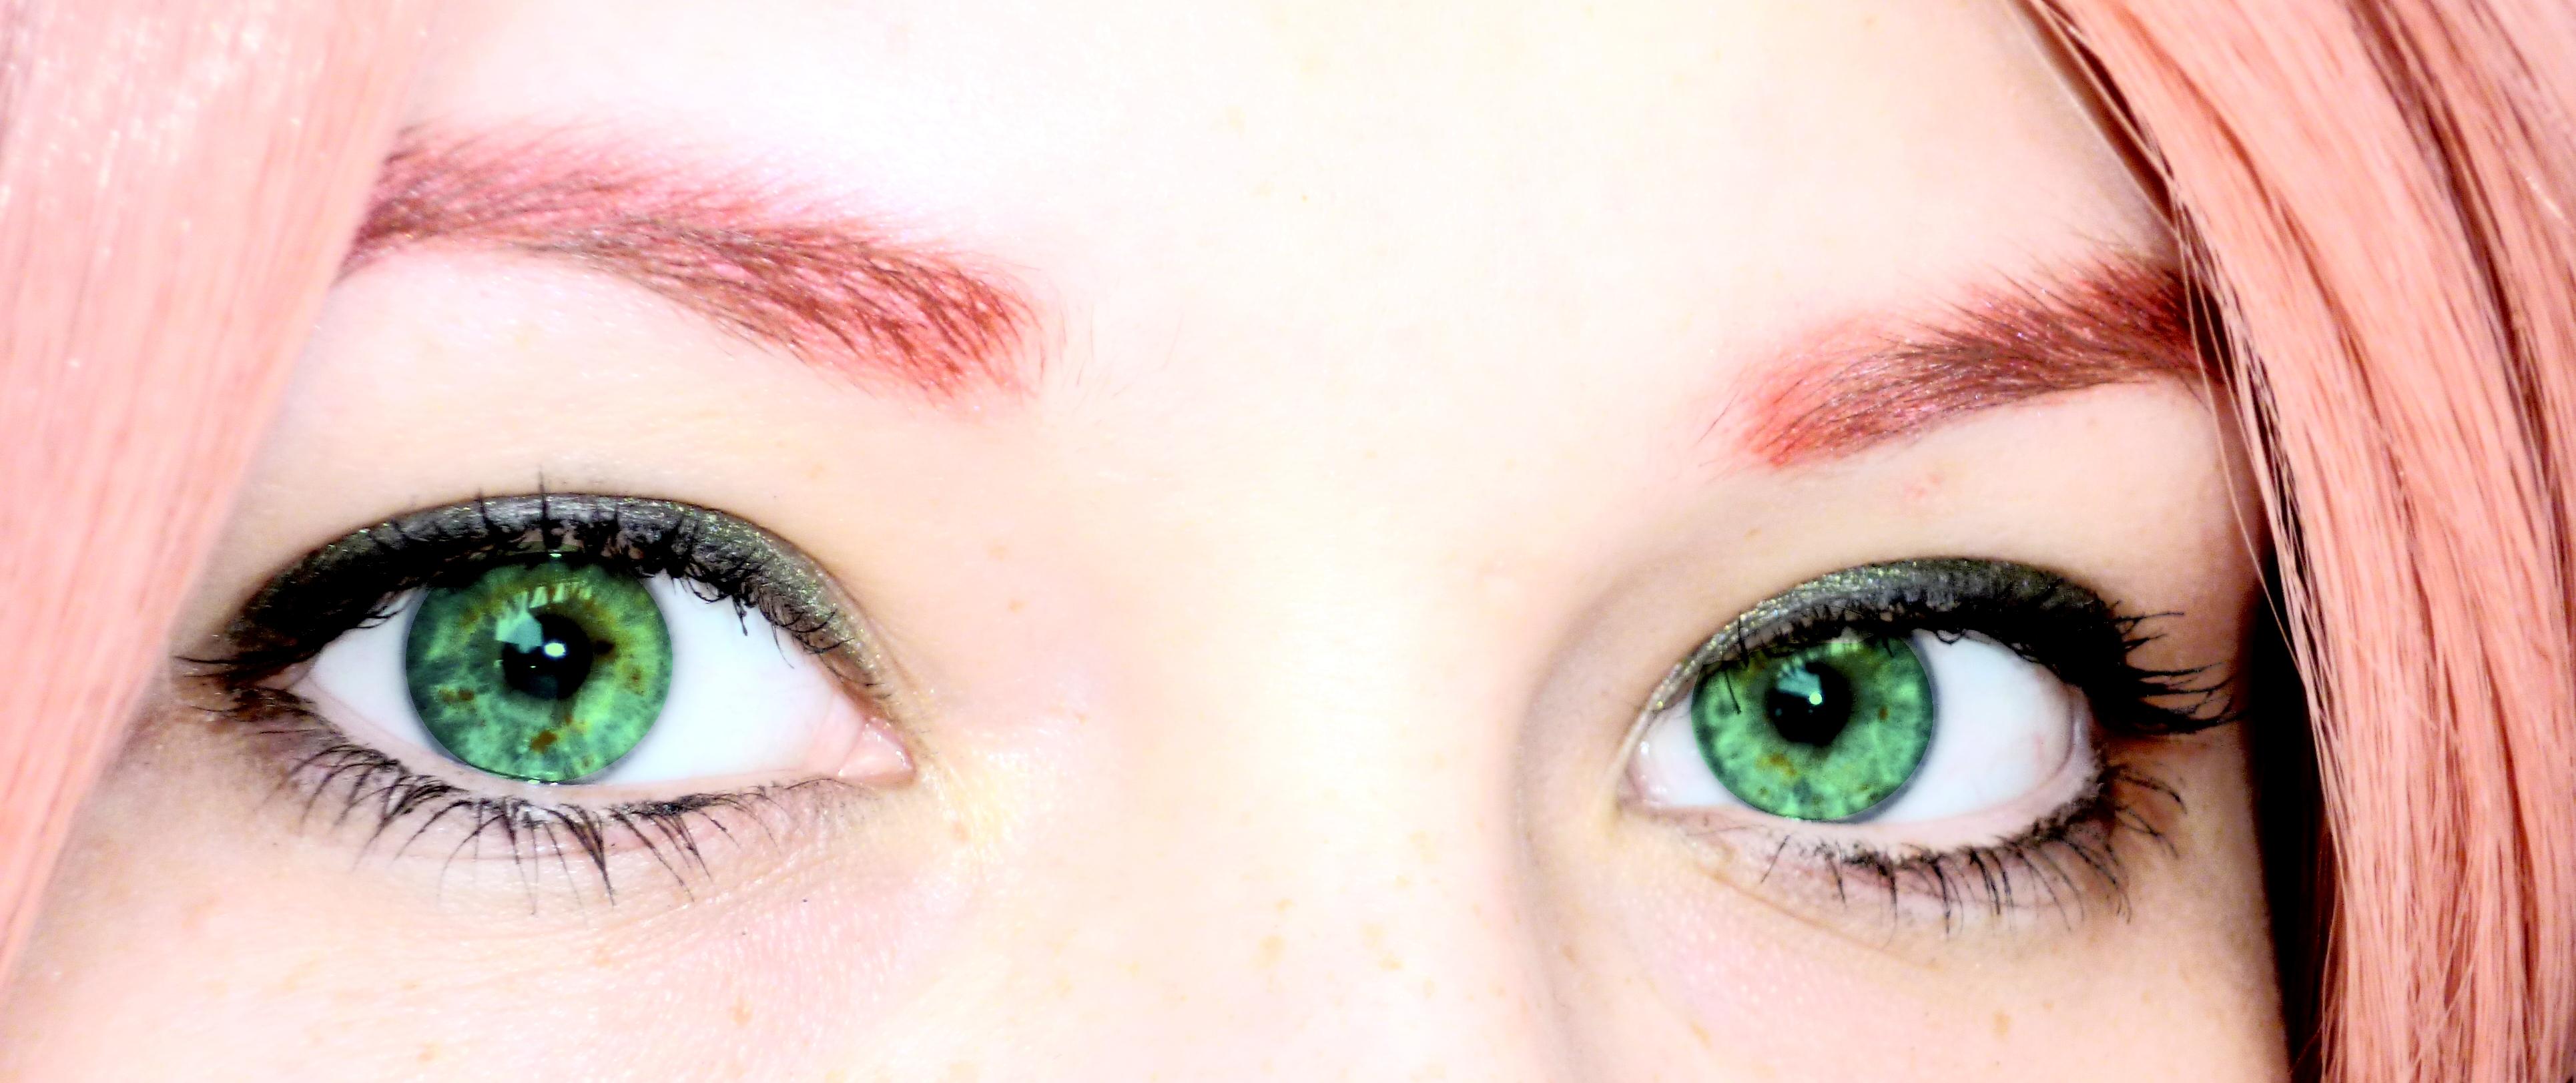 Sakura Haruno green eyes by Gulchachak on DeviantArt